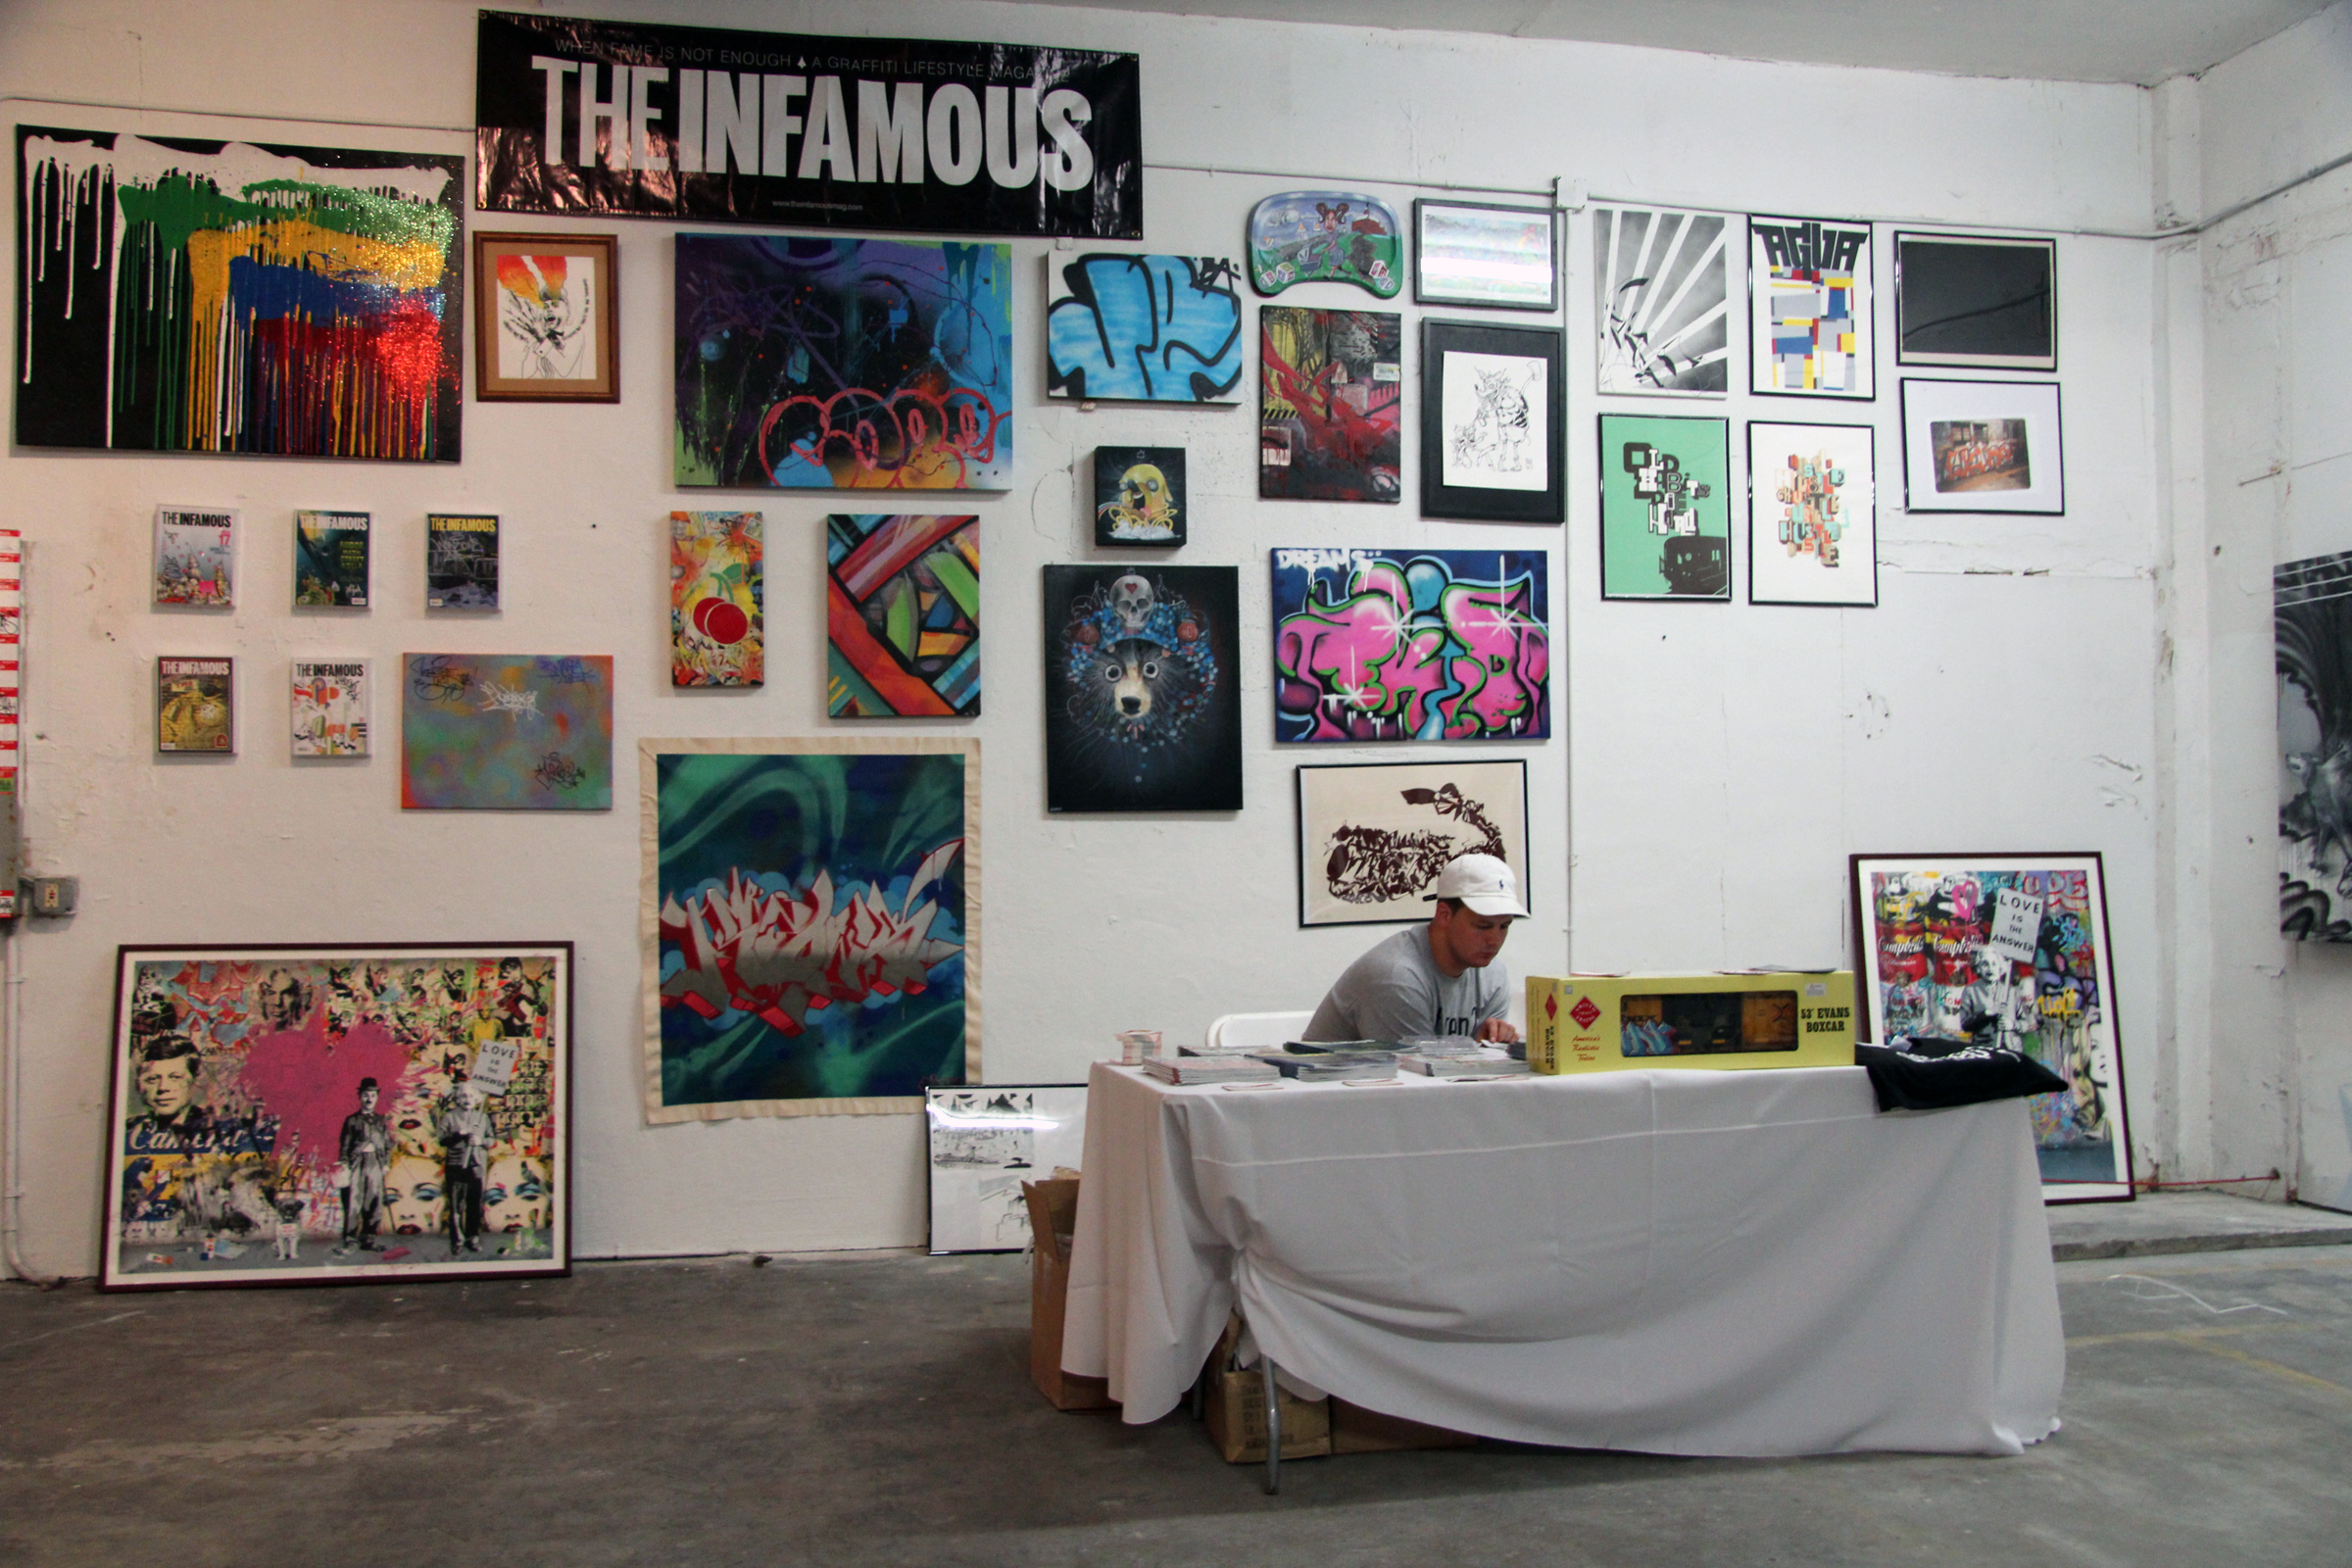 Photo from Art Basel, Wynwood, Miami, 2011.